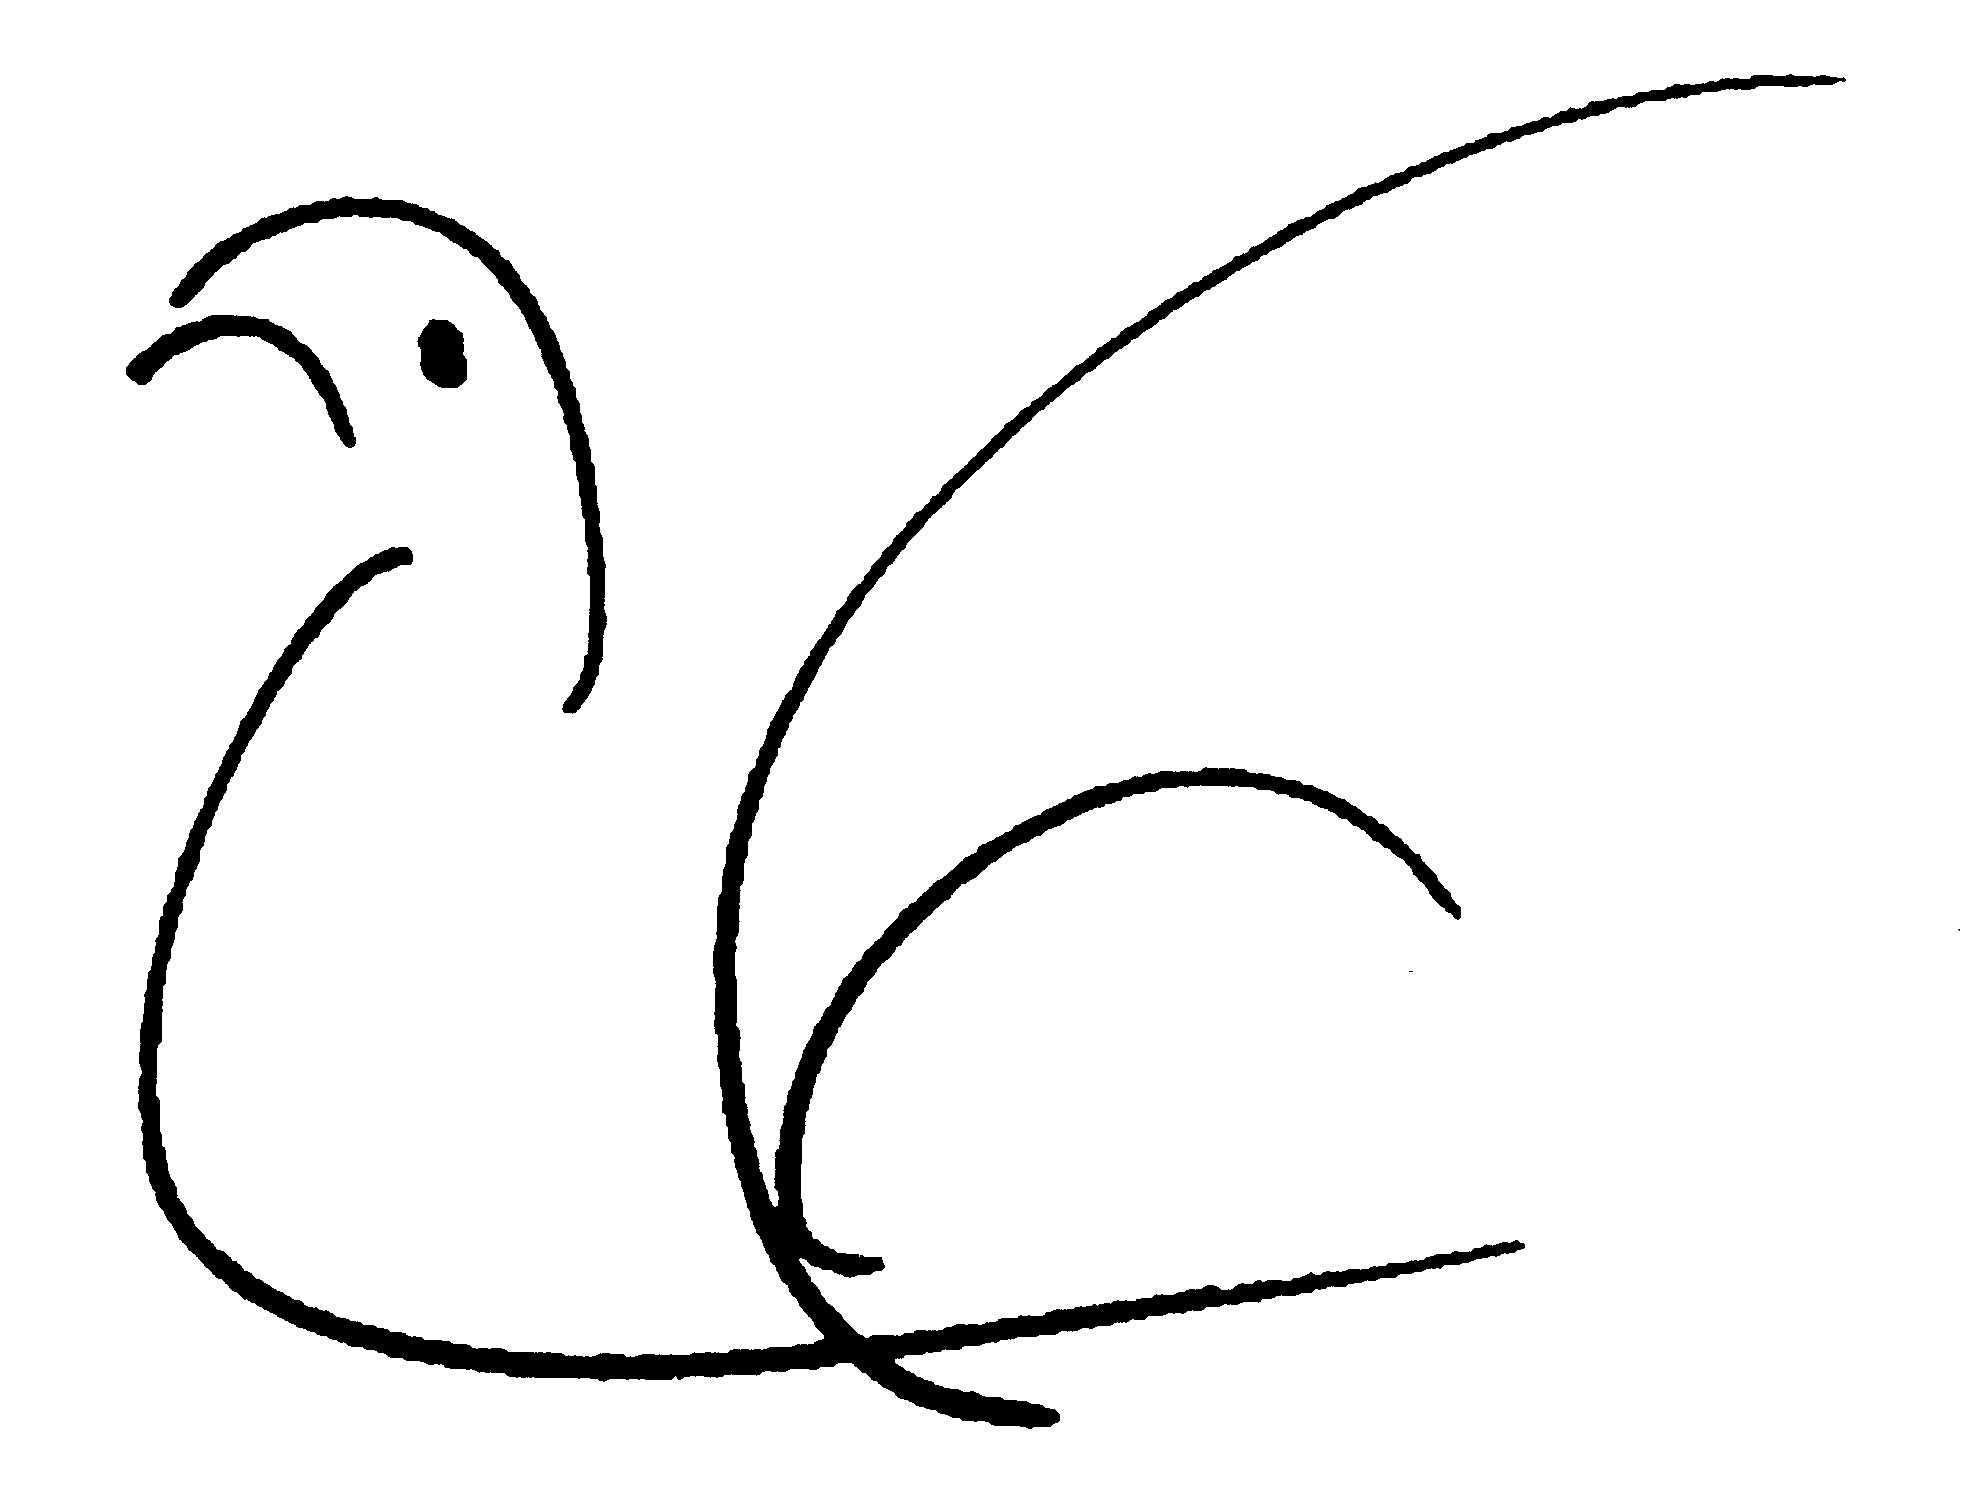 181-ckg-bird